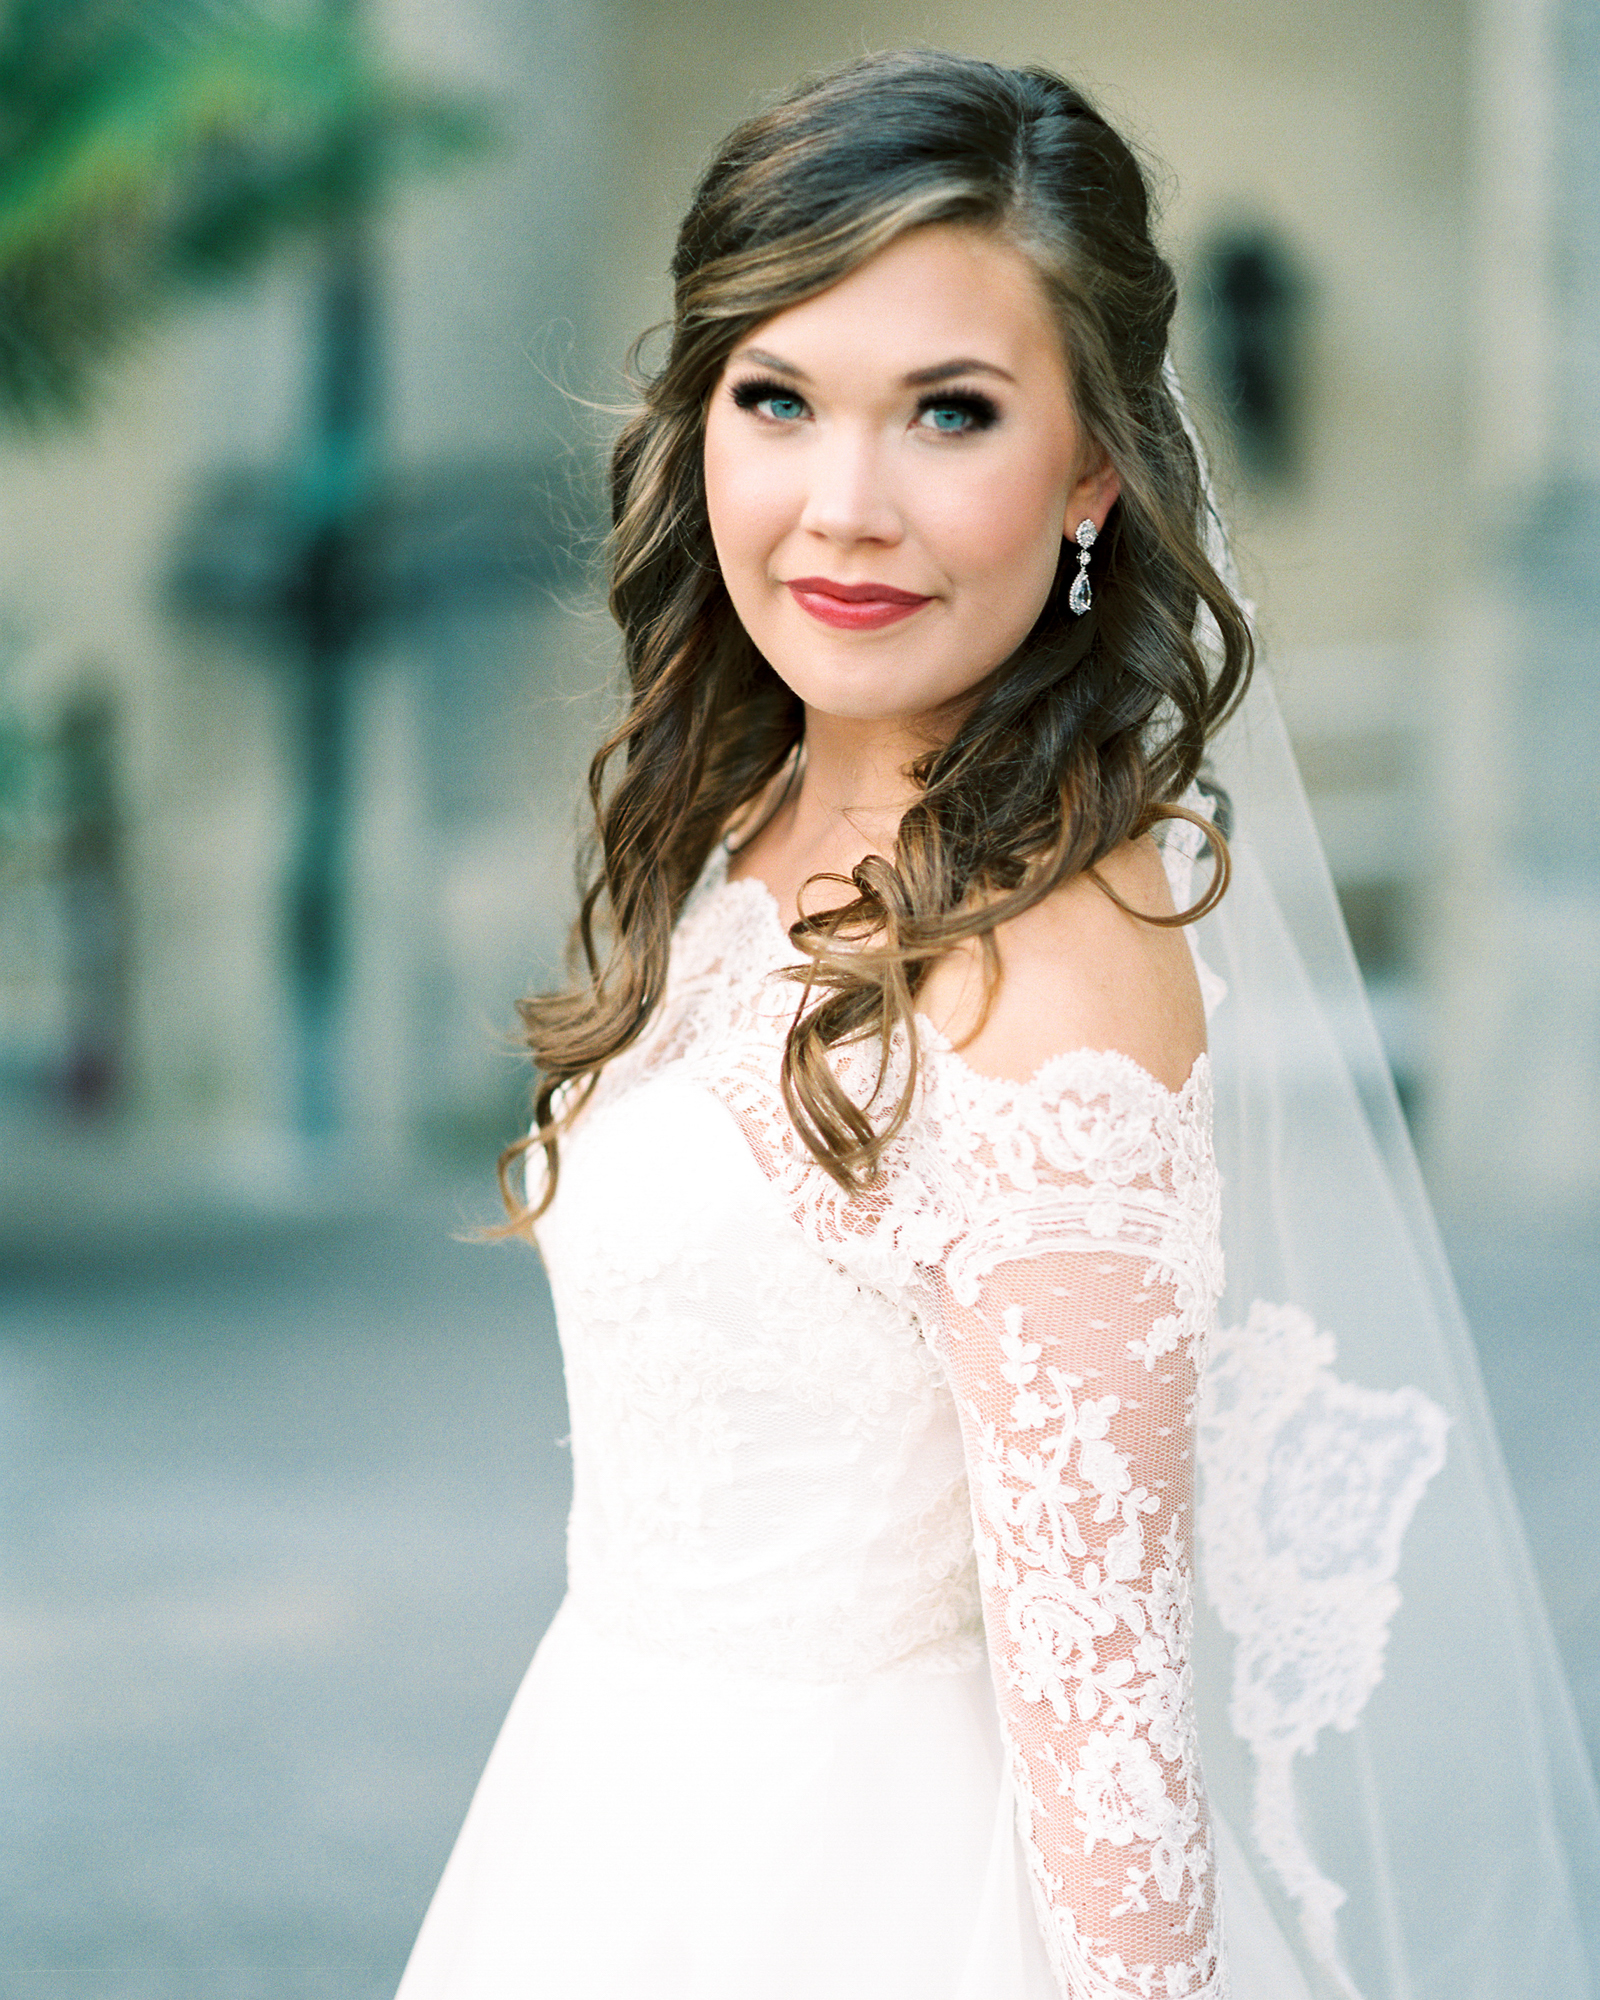 timeless-classy-cathedral-veil-bridal-session-biltmore-north-carolina-wedding-film-photographer-9.jpg